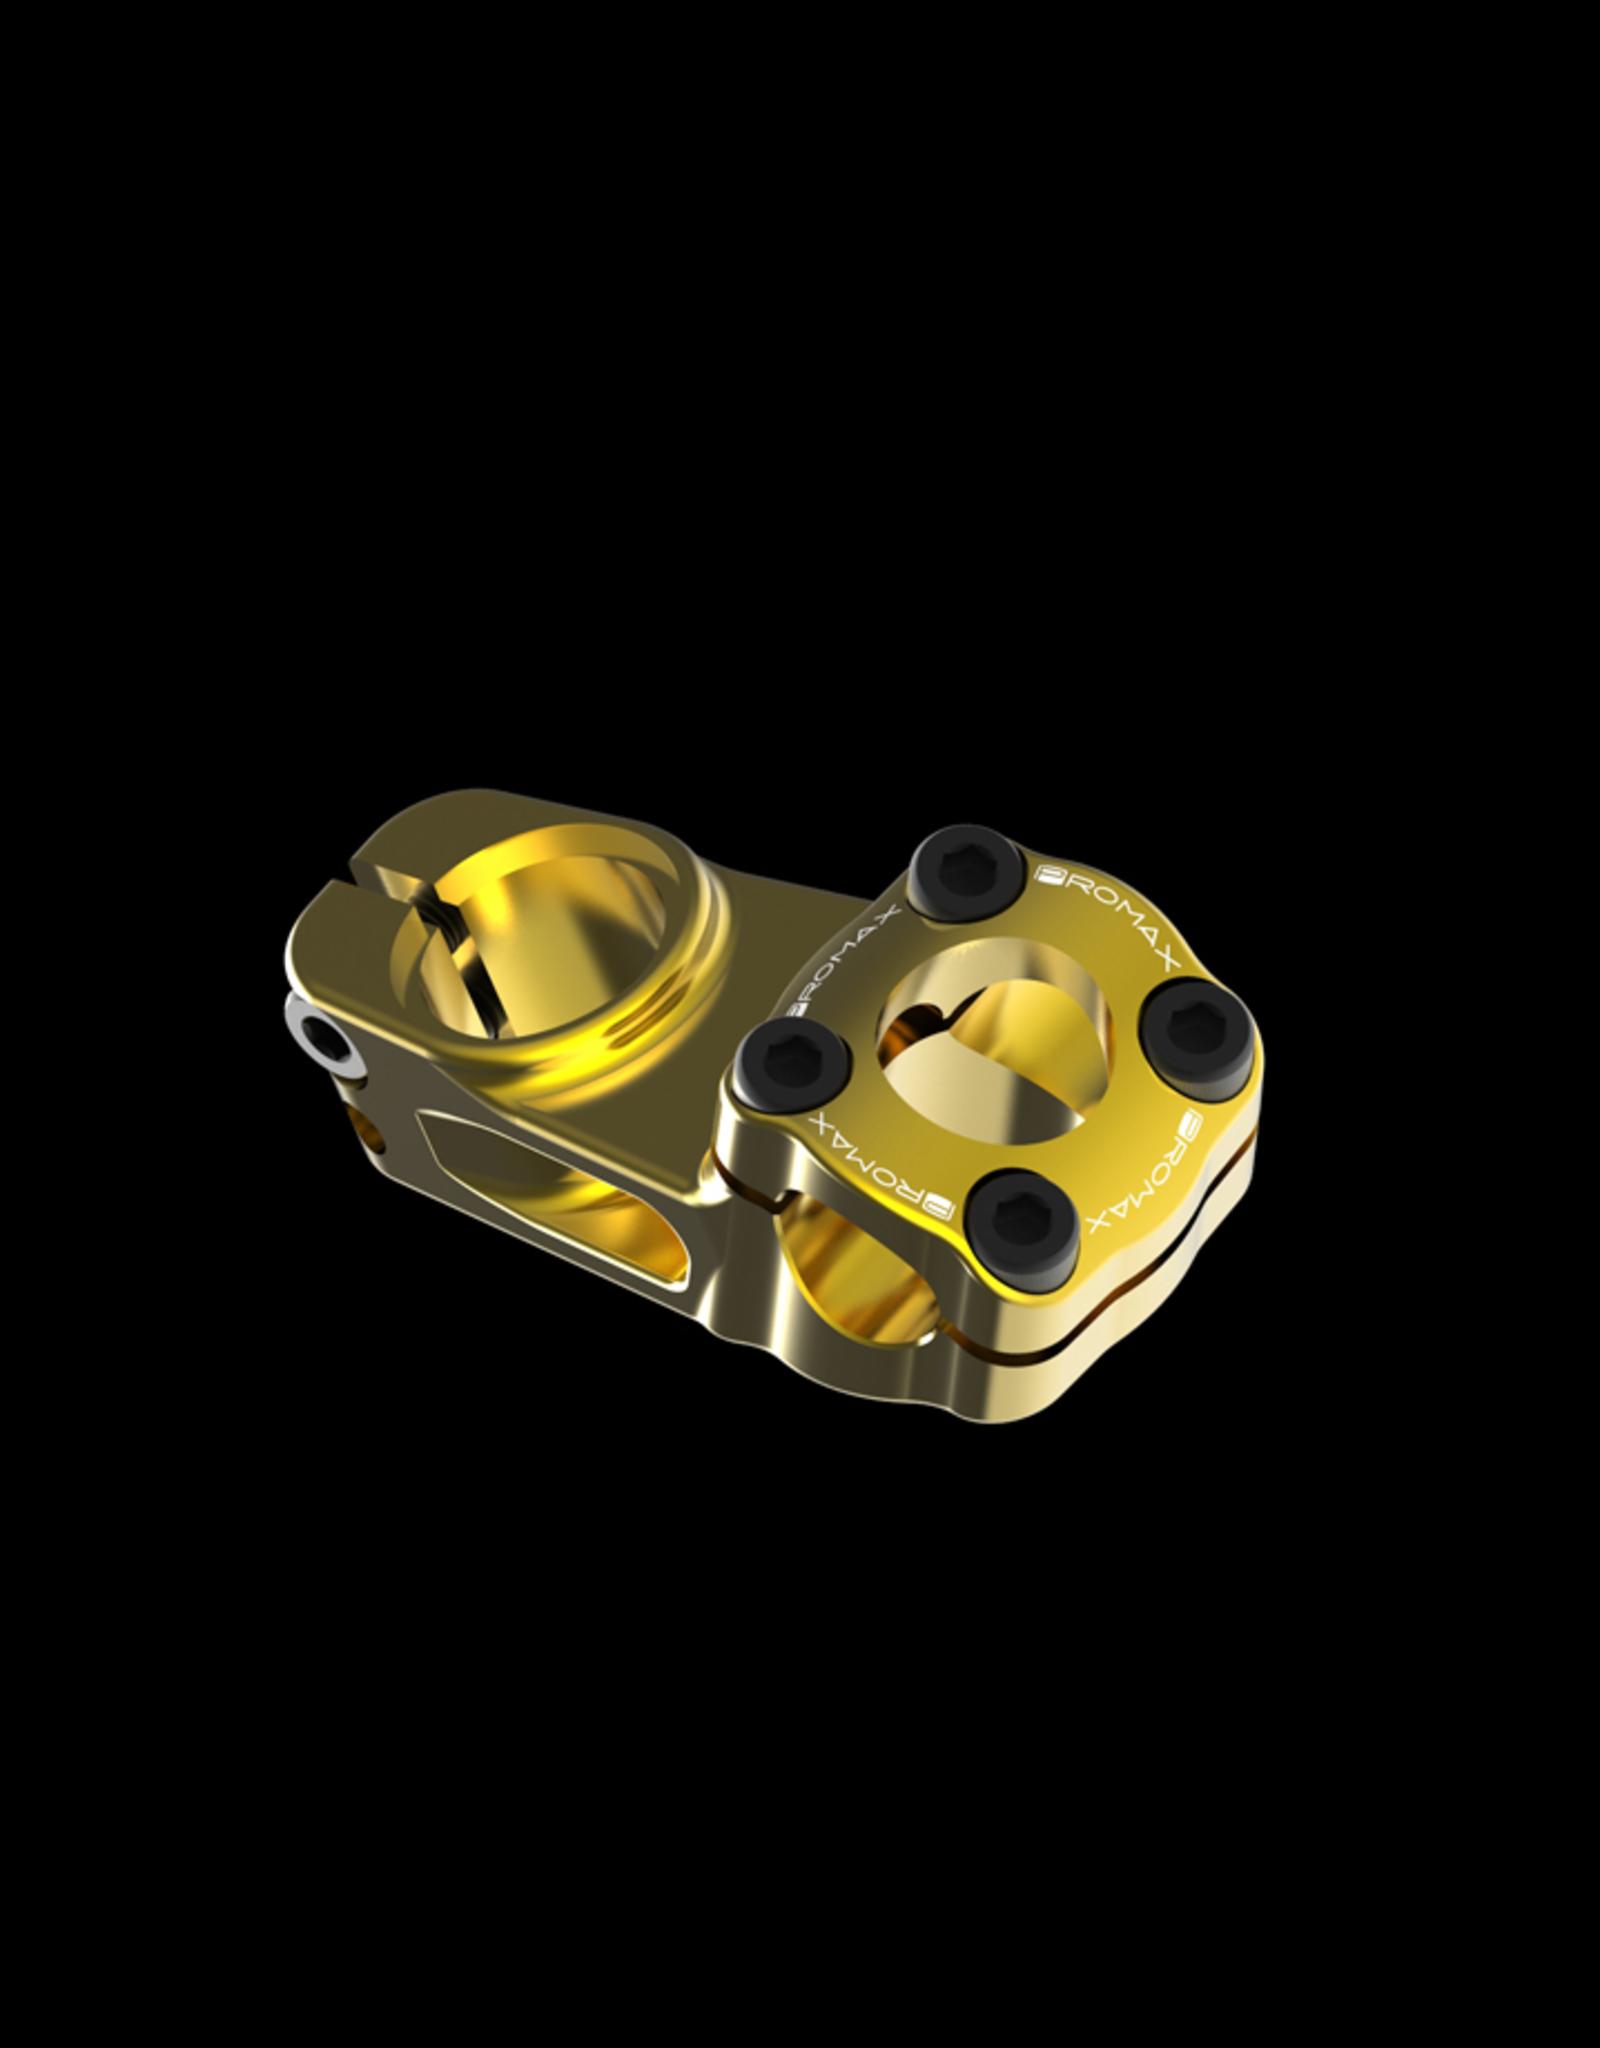 "PROMAX STEM PROMAX IMPACT 1-1/8"" 53MM TOP LOAD GOLD"